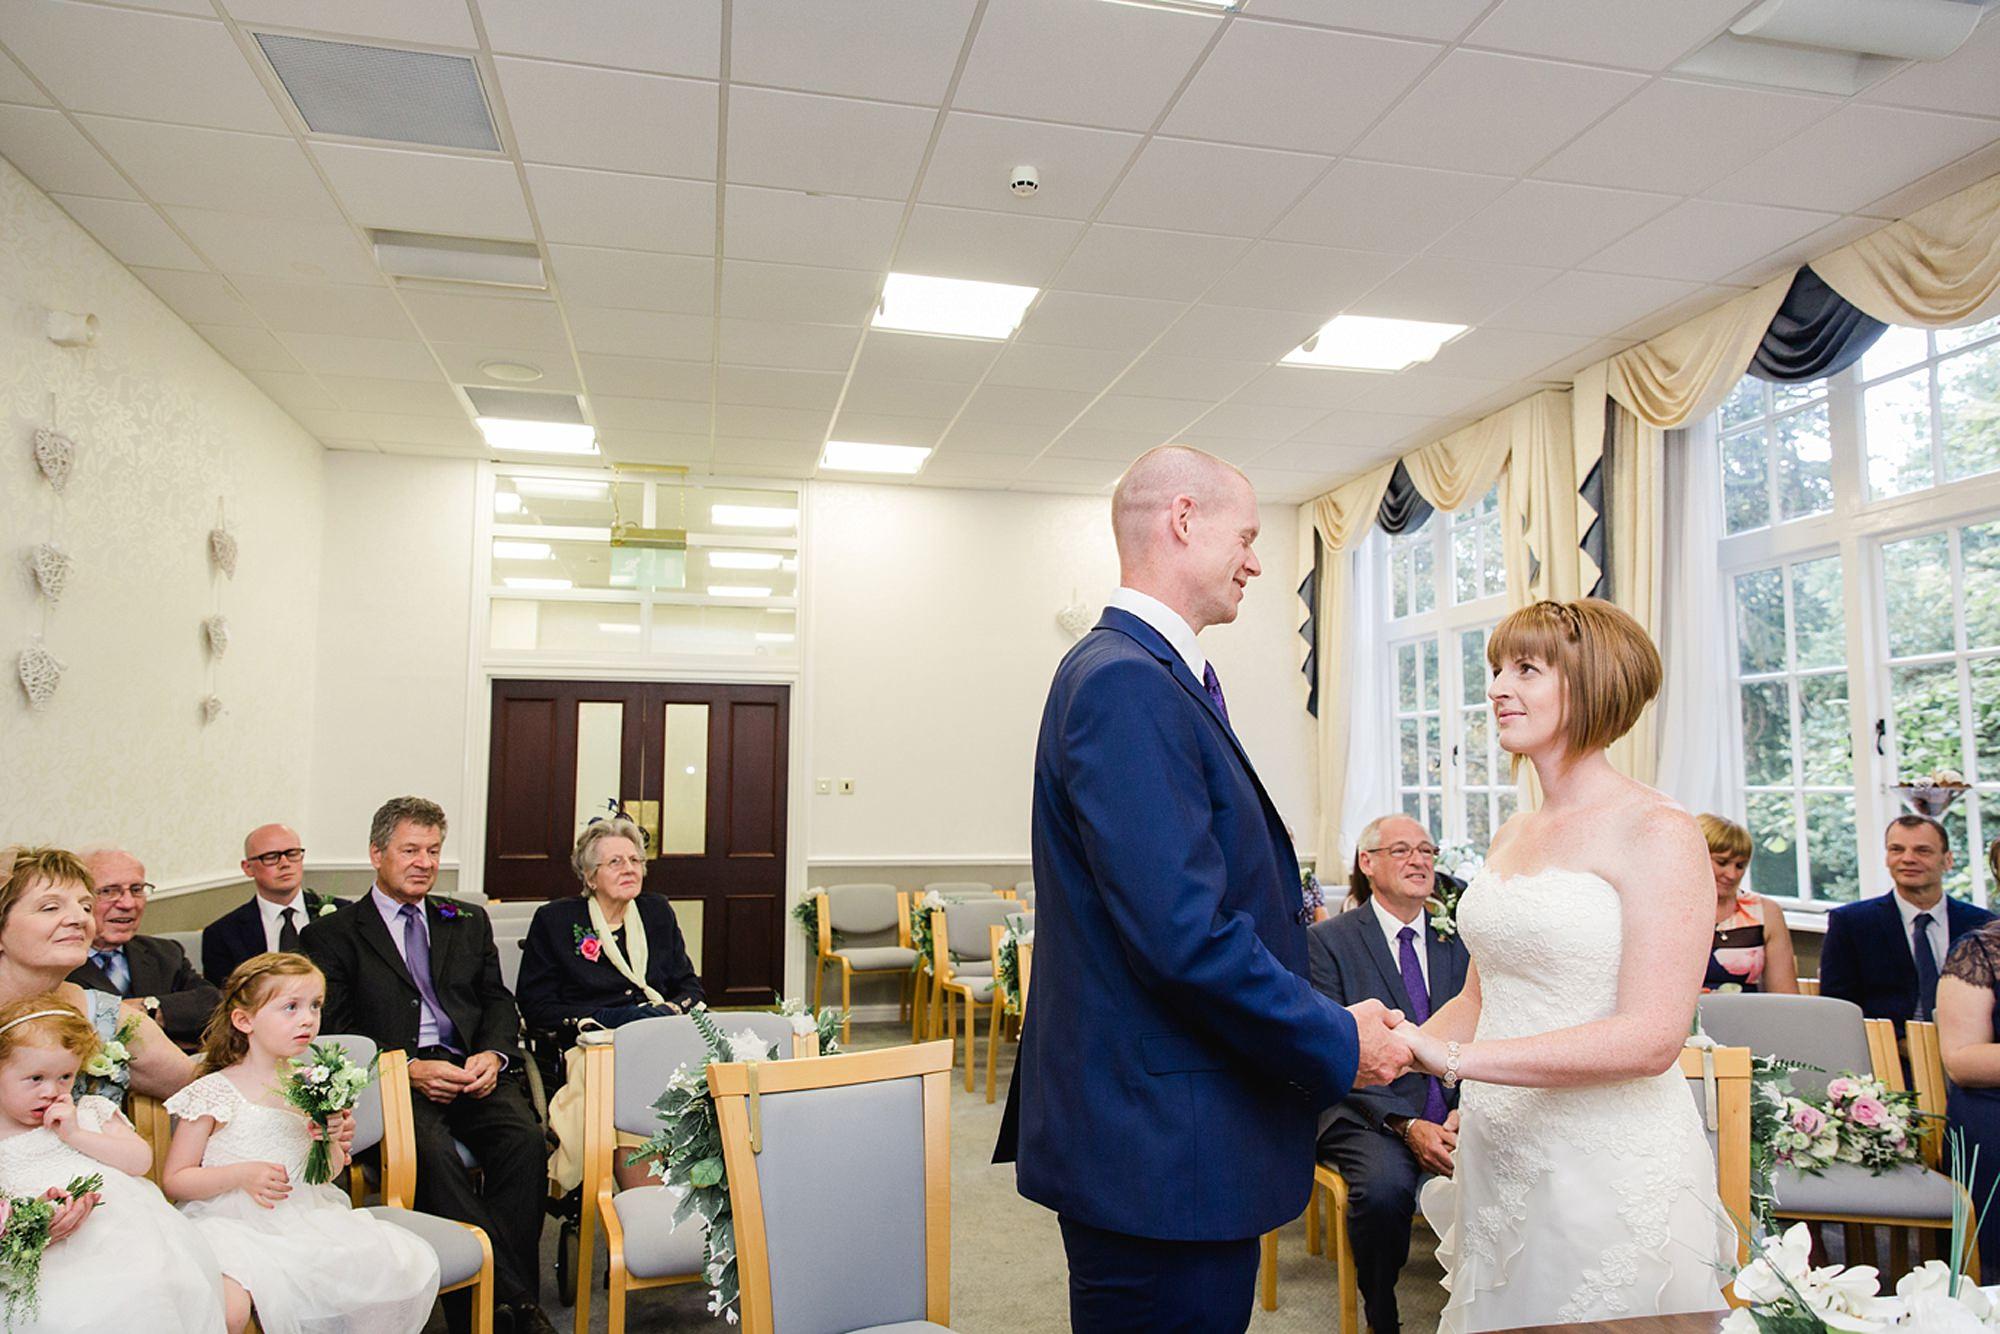 Mill House hotel wedding photography wedding ceremony